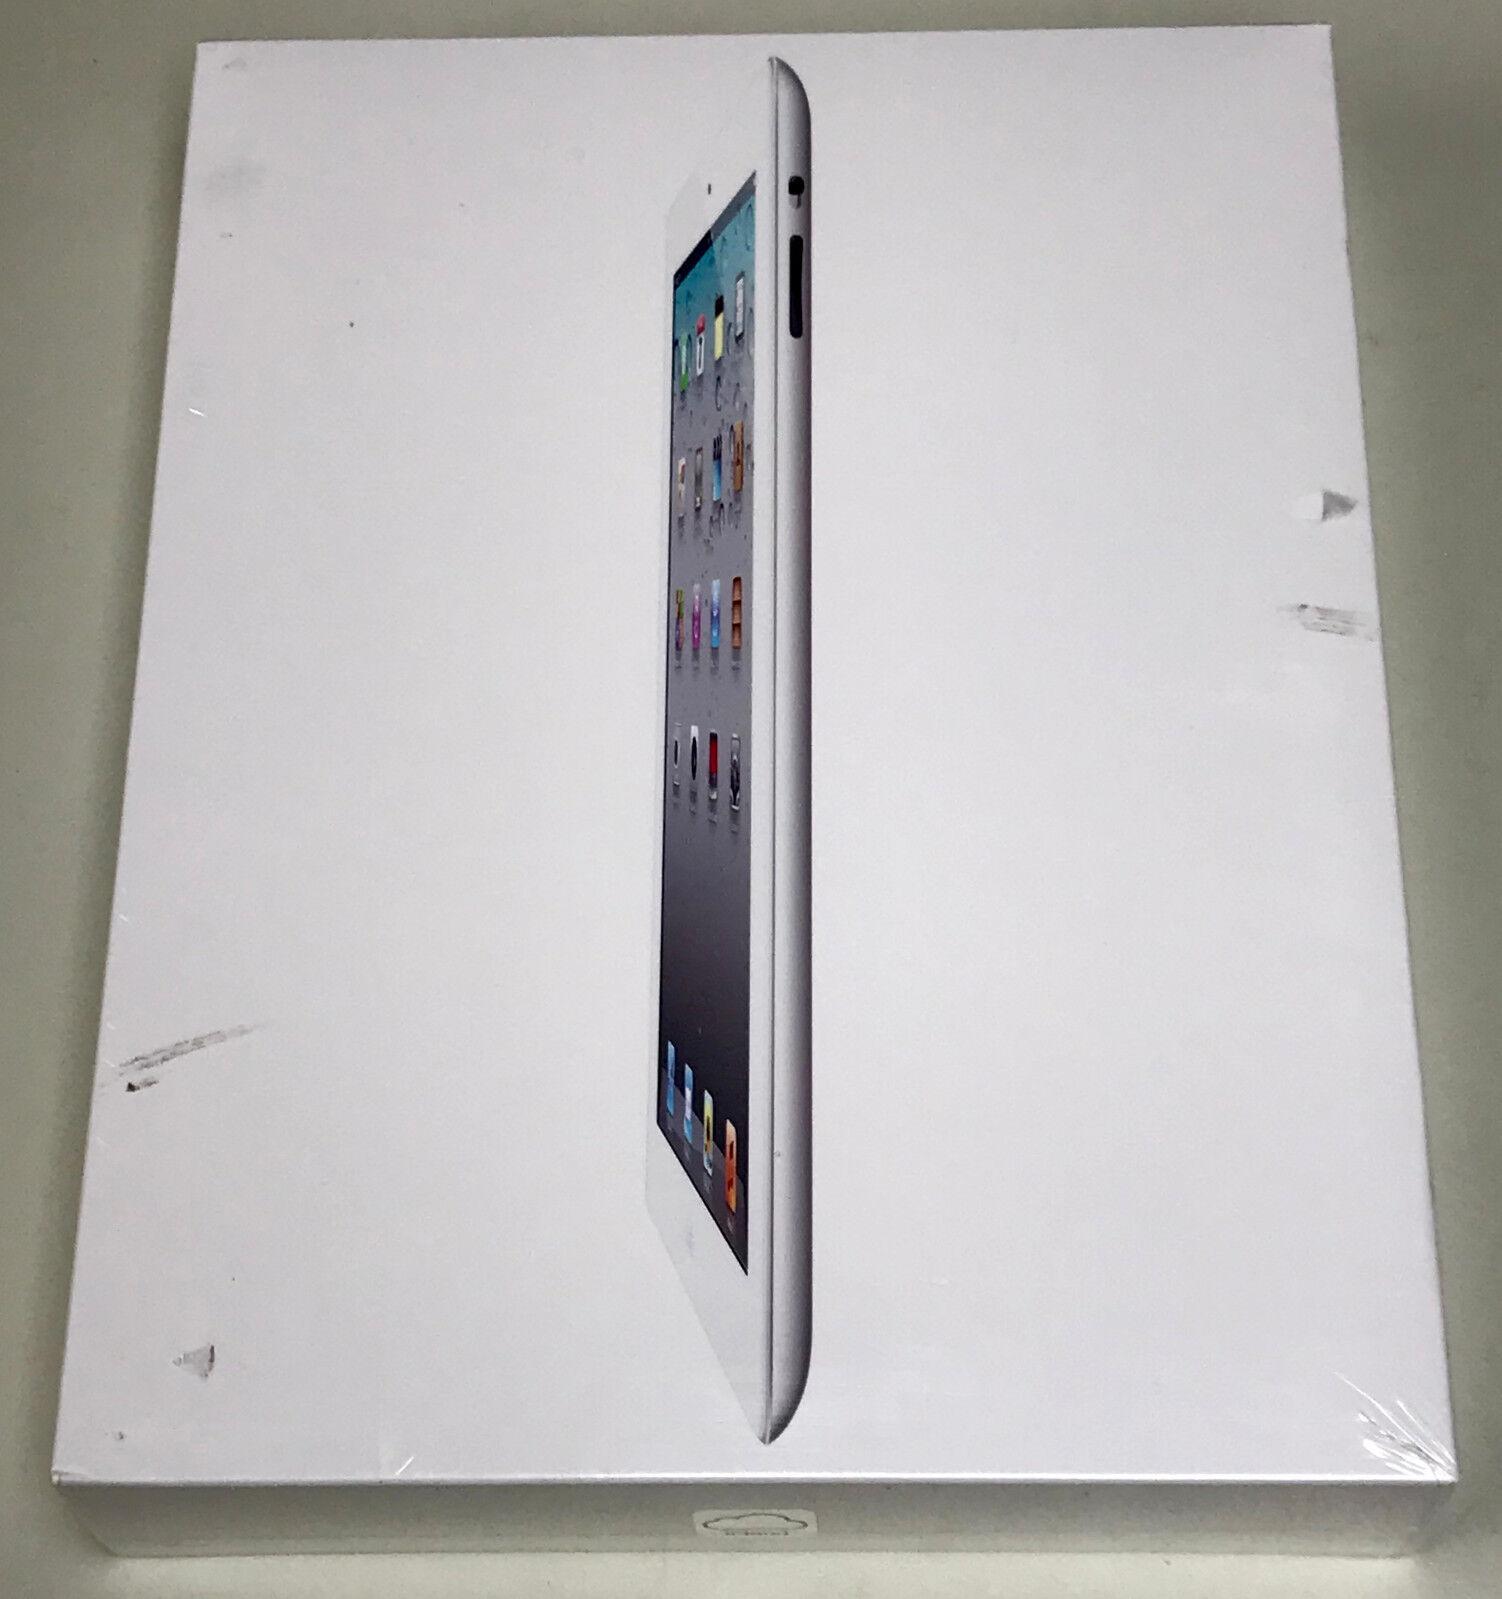 NEW Sealed Apple iPad 2 64GB 3G White Factory Unlocked MC984LL/A A1396 iOS 5